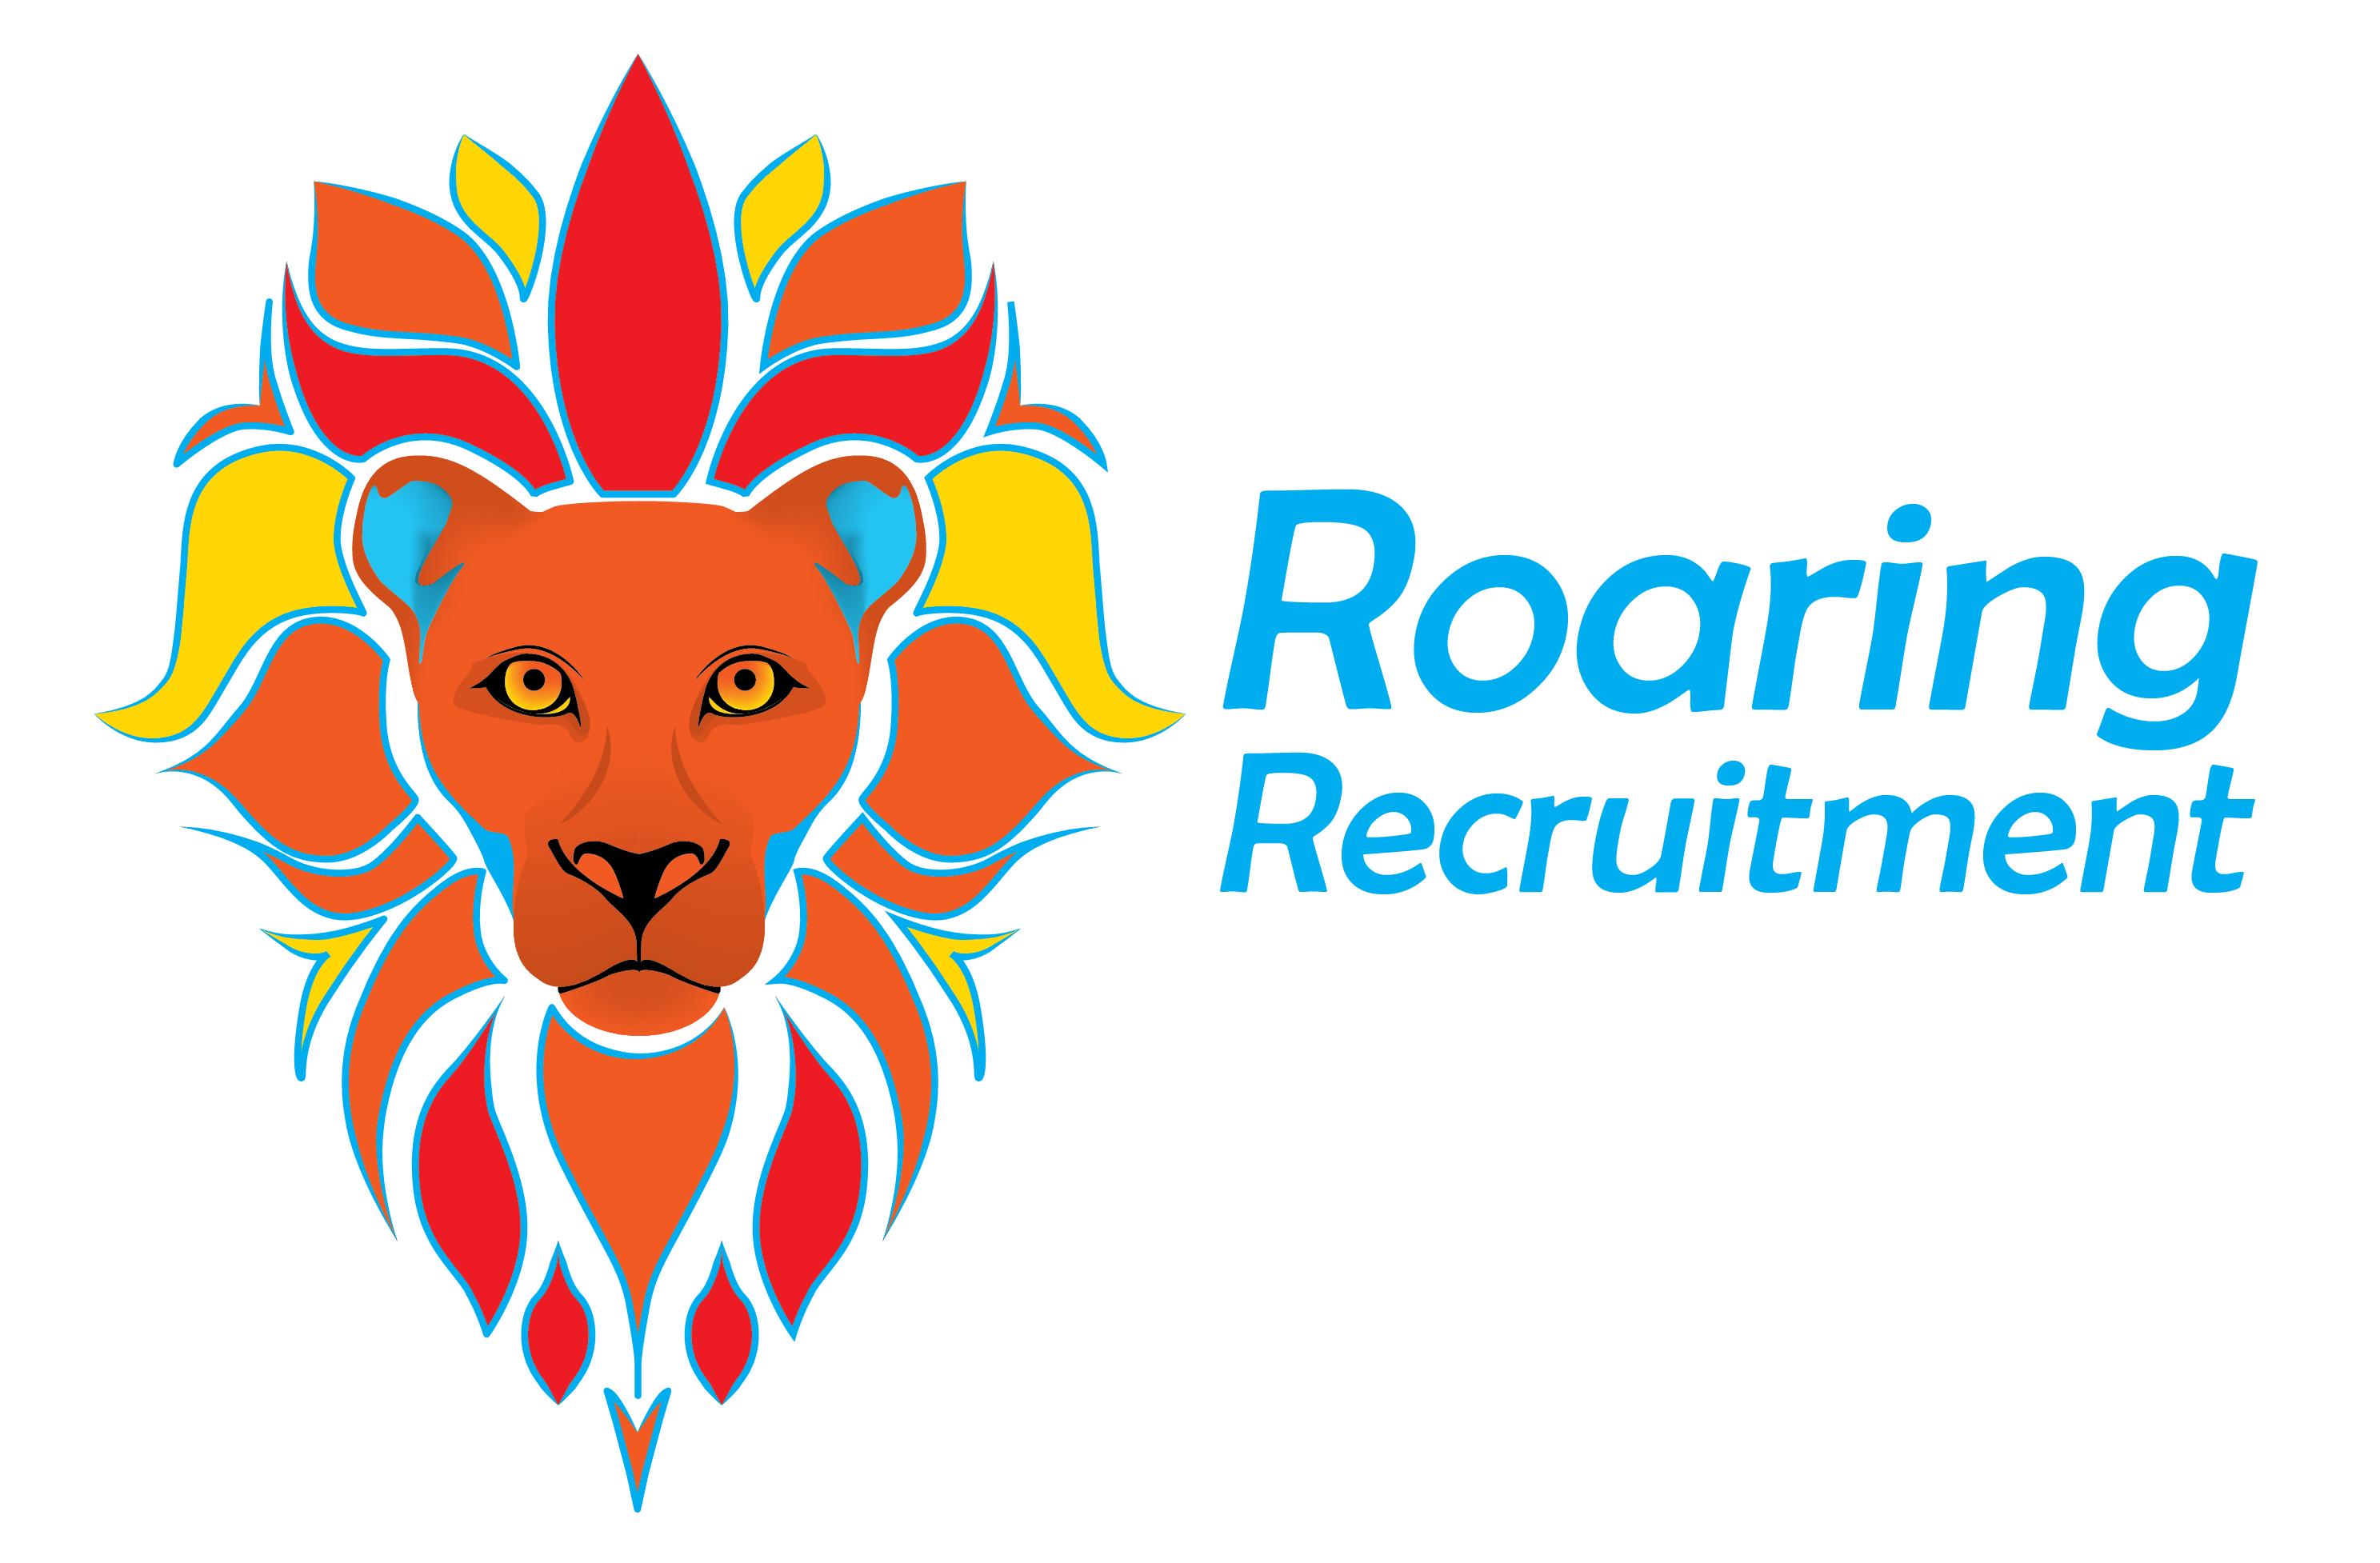 Roaring Recruitment